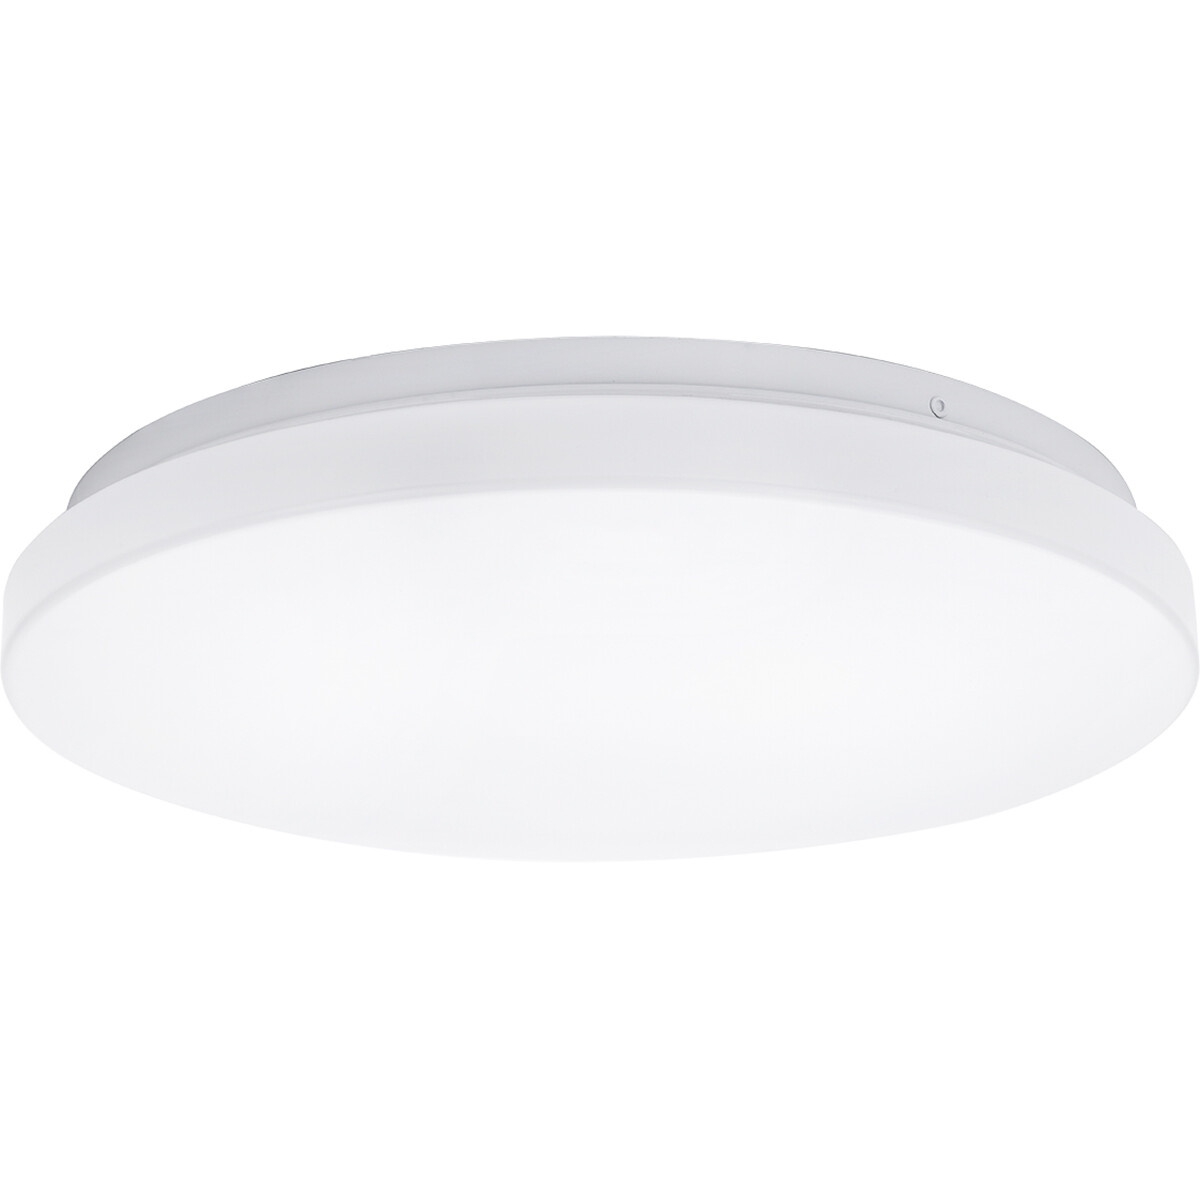 LED Plafondlamp - Aigi Alona - Opbouw Rond - 12W - Warm Wit 3000K - Mat Wit - Kunststof